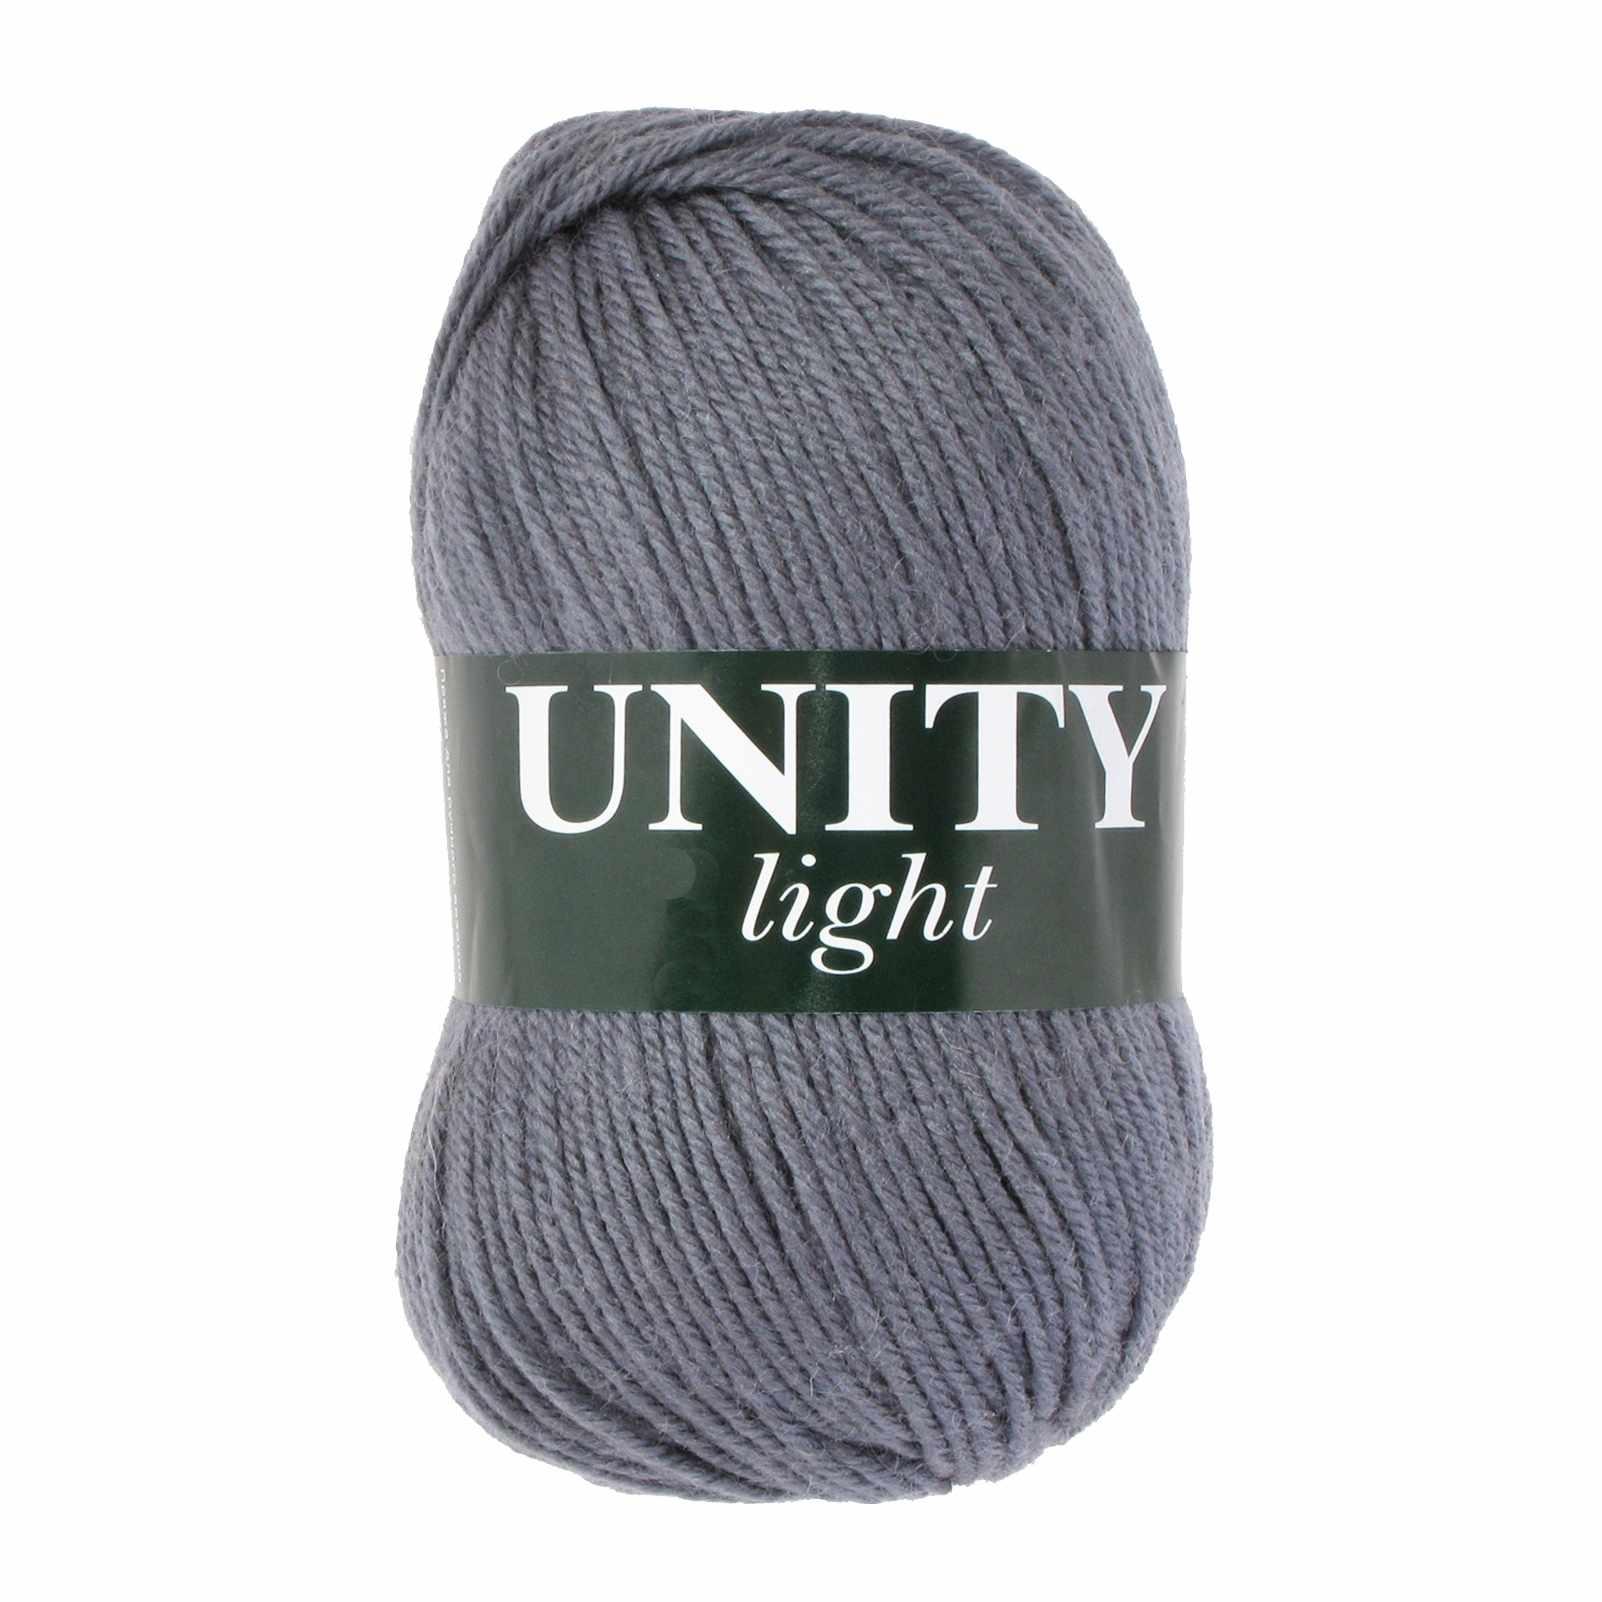 Пряжа VITA Unity light Цвет.6042 Серый